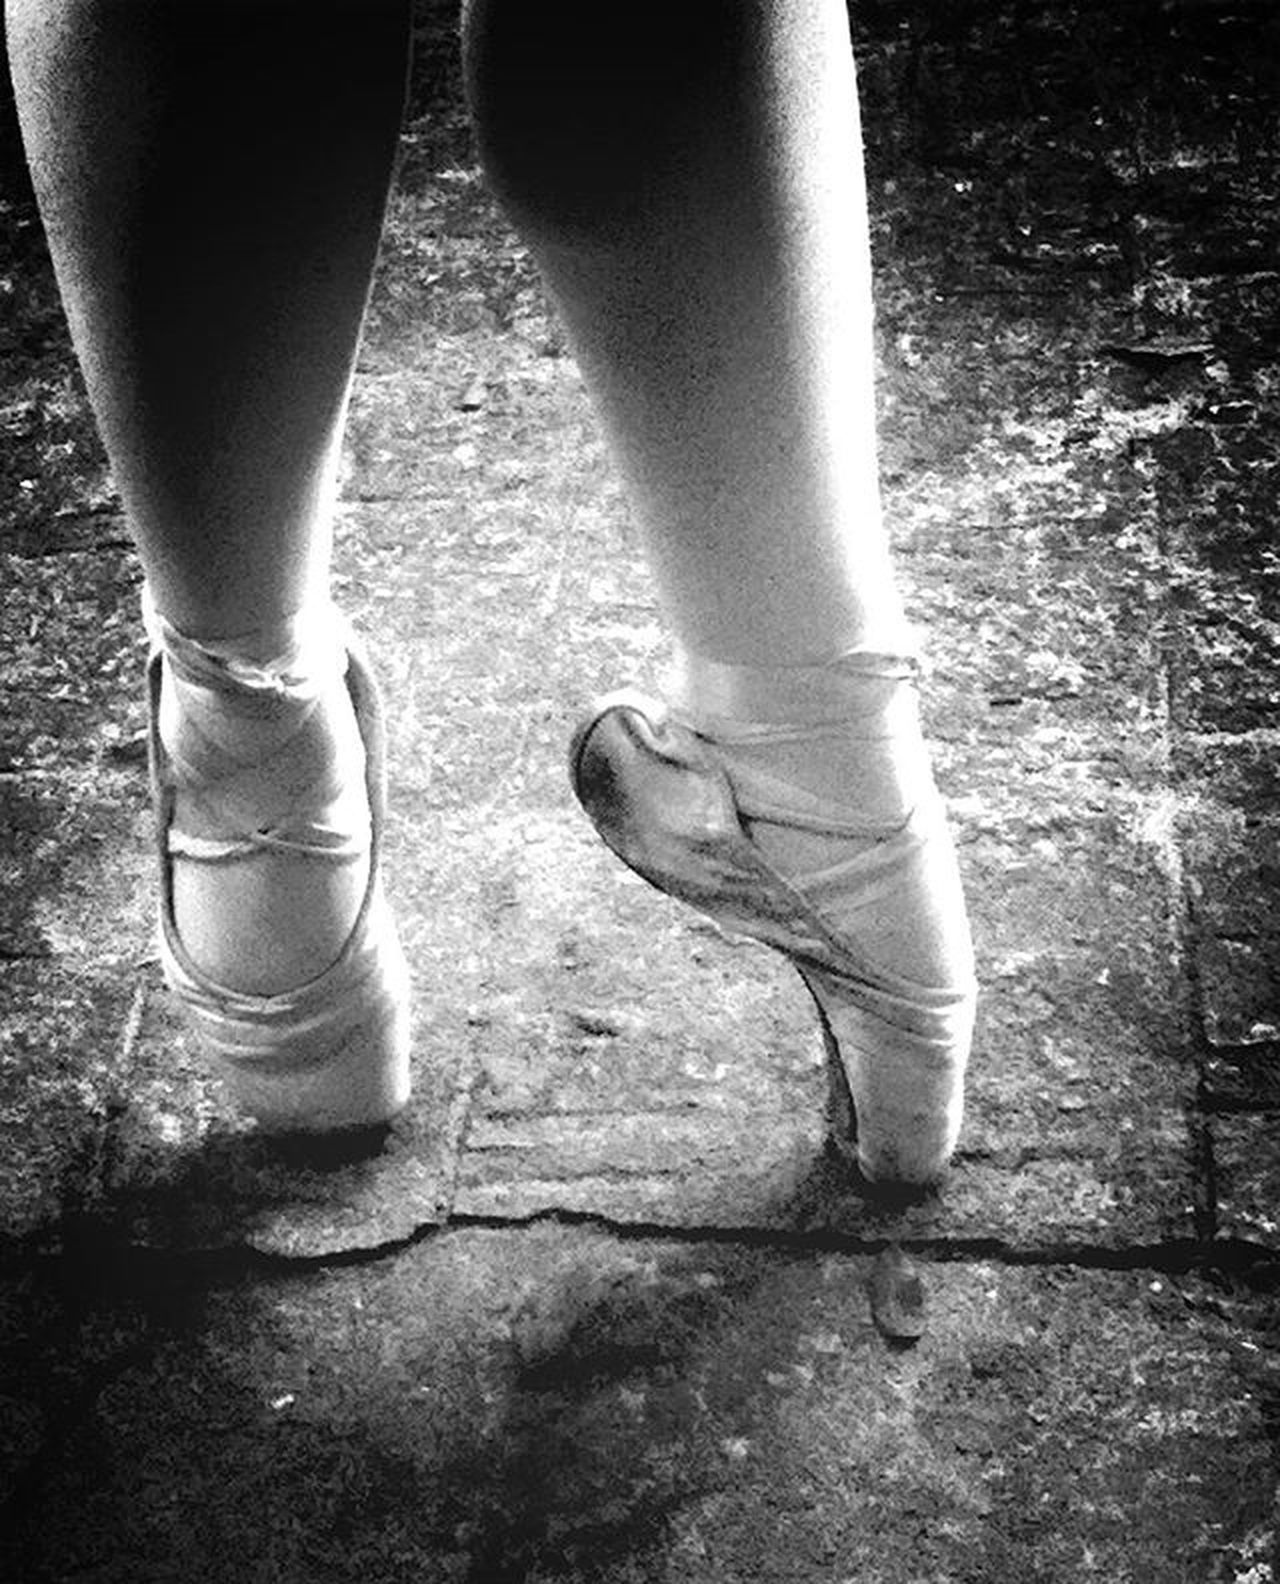 Ballet Blackandwhite Blackandwhitephotography Photography Photo Photographer Photoofday PretoNoBranco Pretoebranco Sapatilhadeponta Bailarina Tagsinstagram Instaballet Dança Tags Tagsforlikes Instabrasil Instagram Instagrambrasil Brazil Braziliangirl Photogram